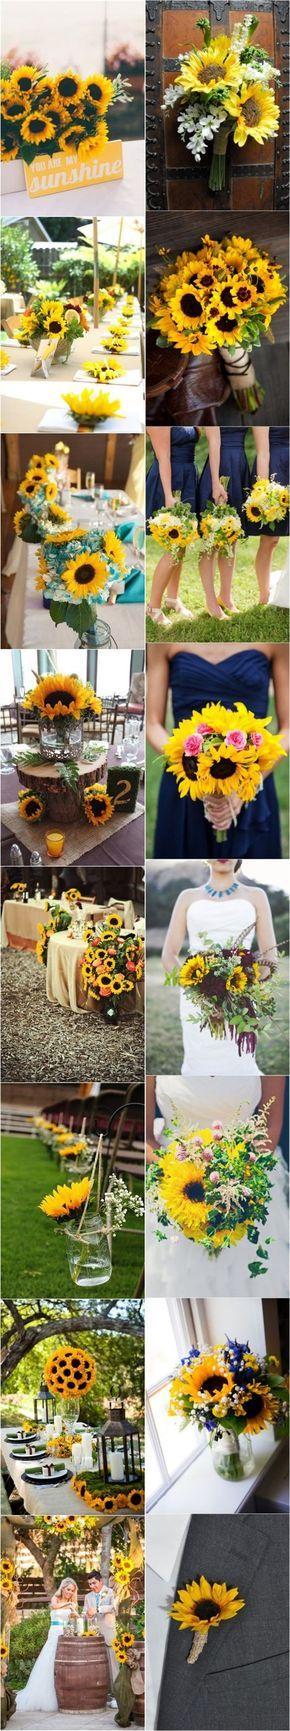 70 Sunflower Wedding Ideas And Wedding Invitations Mz Wedding